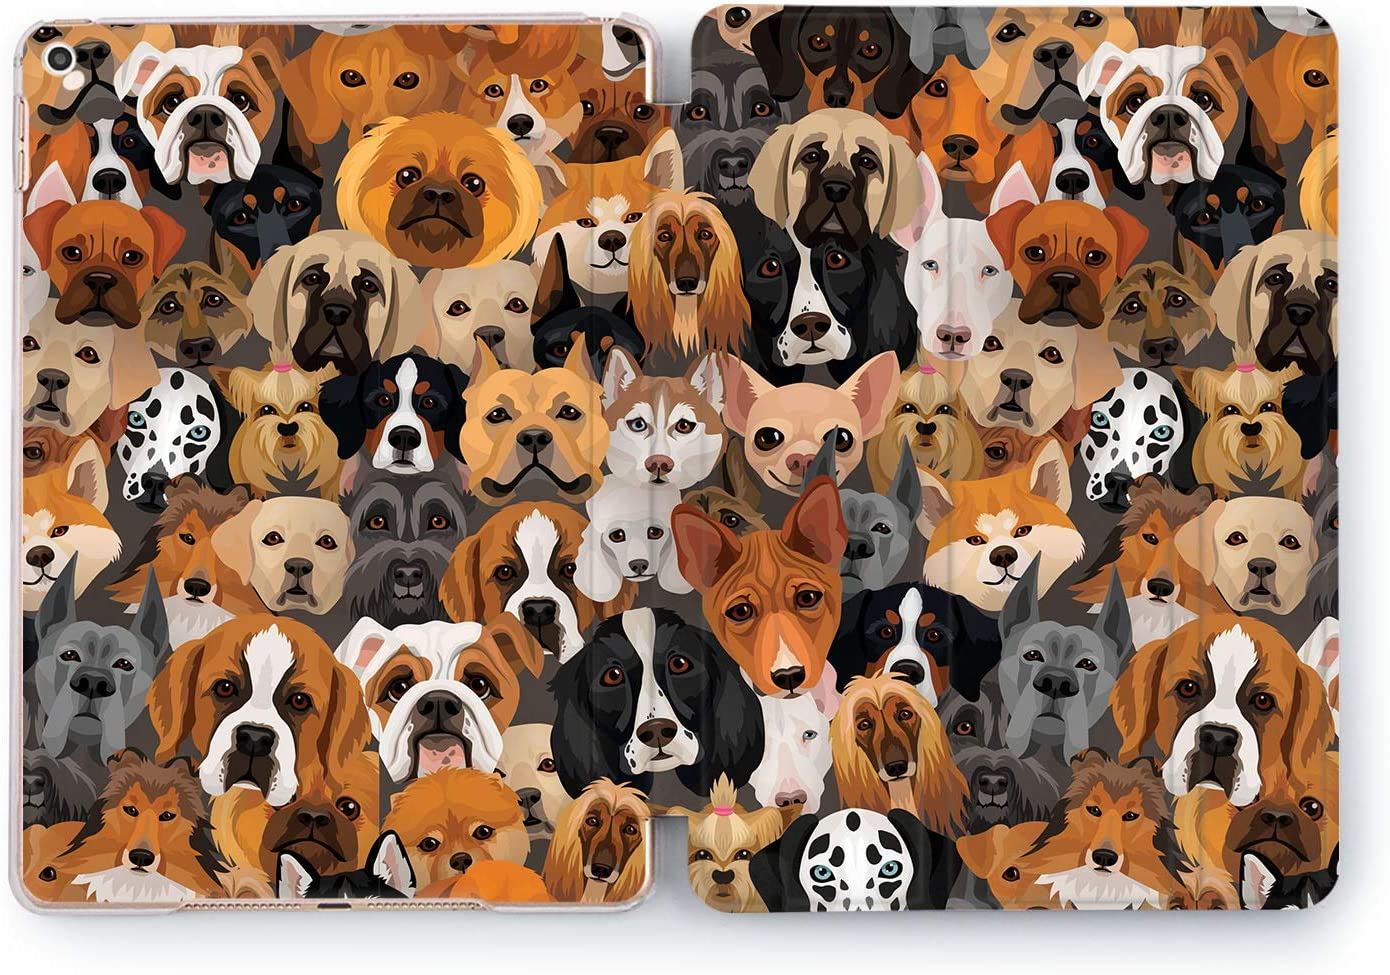 Wonder Wild Dog Picture Design Case for Apple iPad 2 3 4 Pro 9.7 11 inch Mini 1 2 3 4 5 Air 2 10.5 12.9 2018 2017 5th 6th Gen Clear Smart Hard Cover Pet Basset Bulldog Puppy Breeds Akita Dachshund